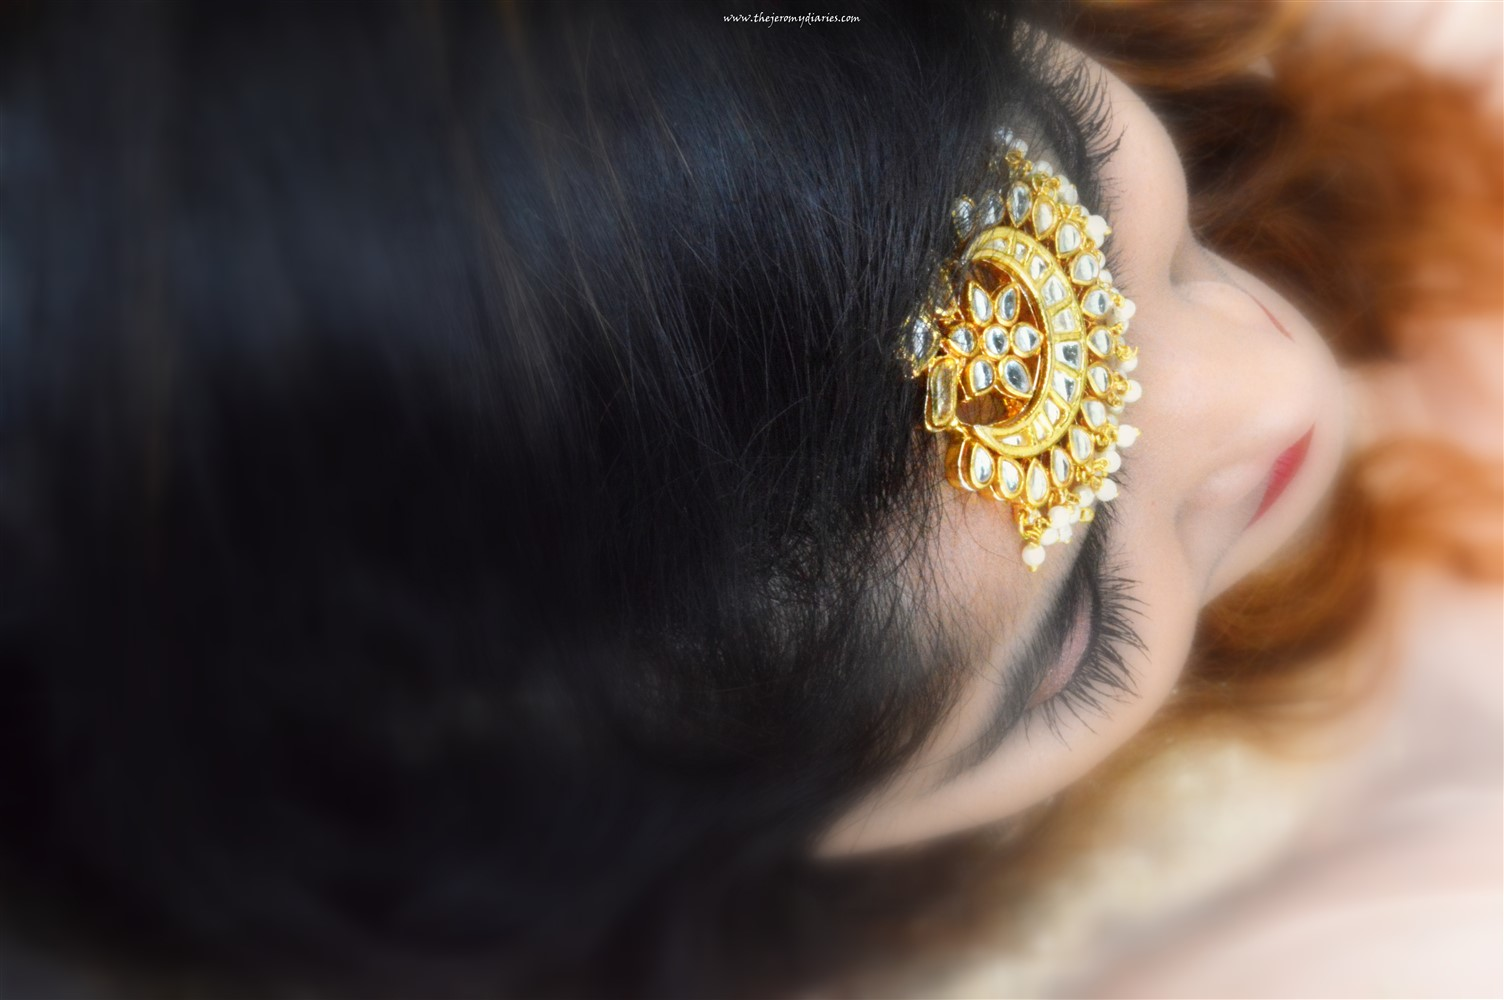 anahe jewellery maang tika the jeromy diaries fashion blogger